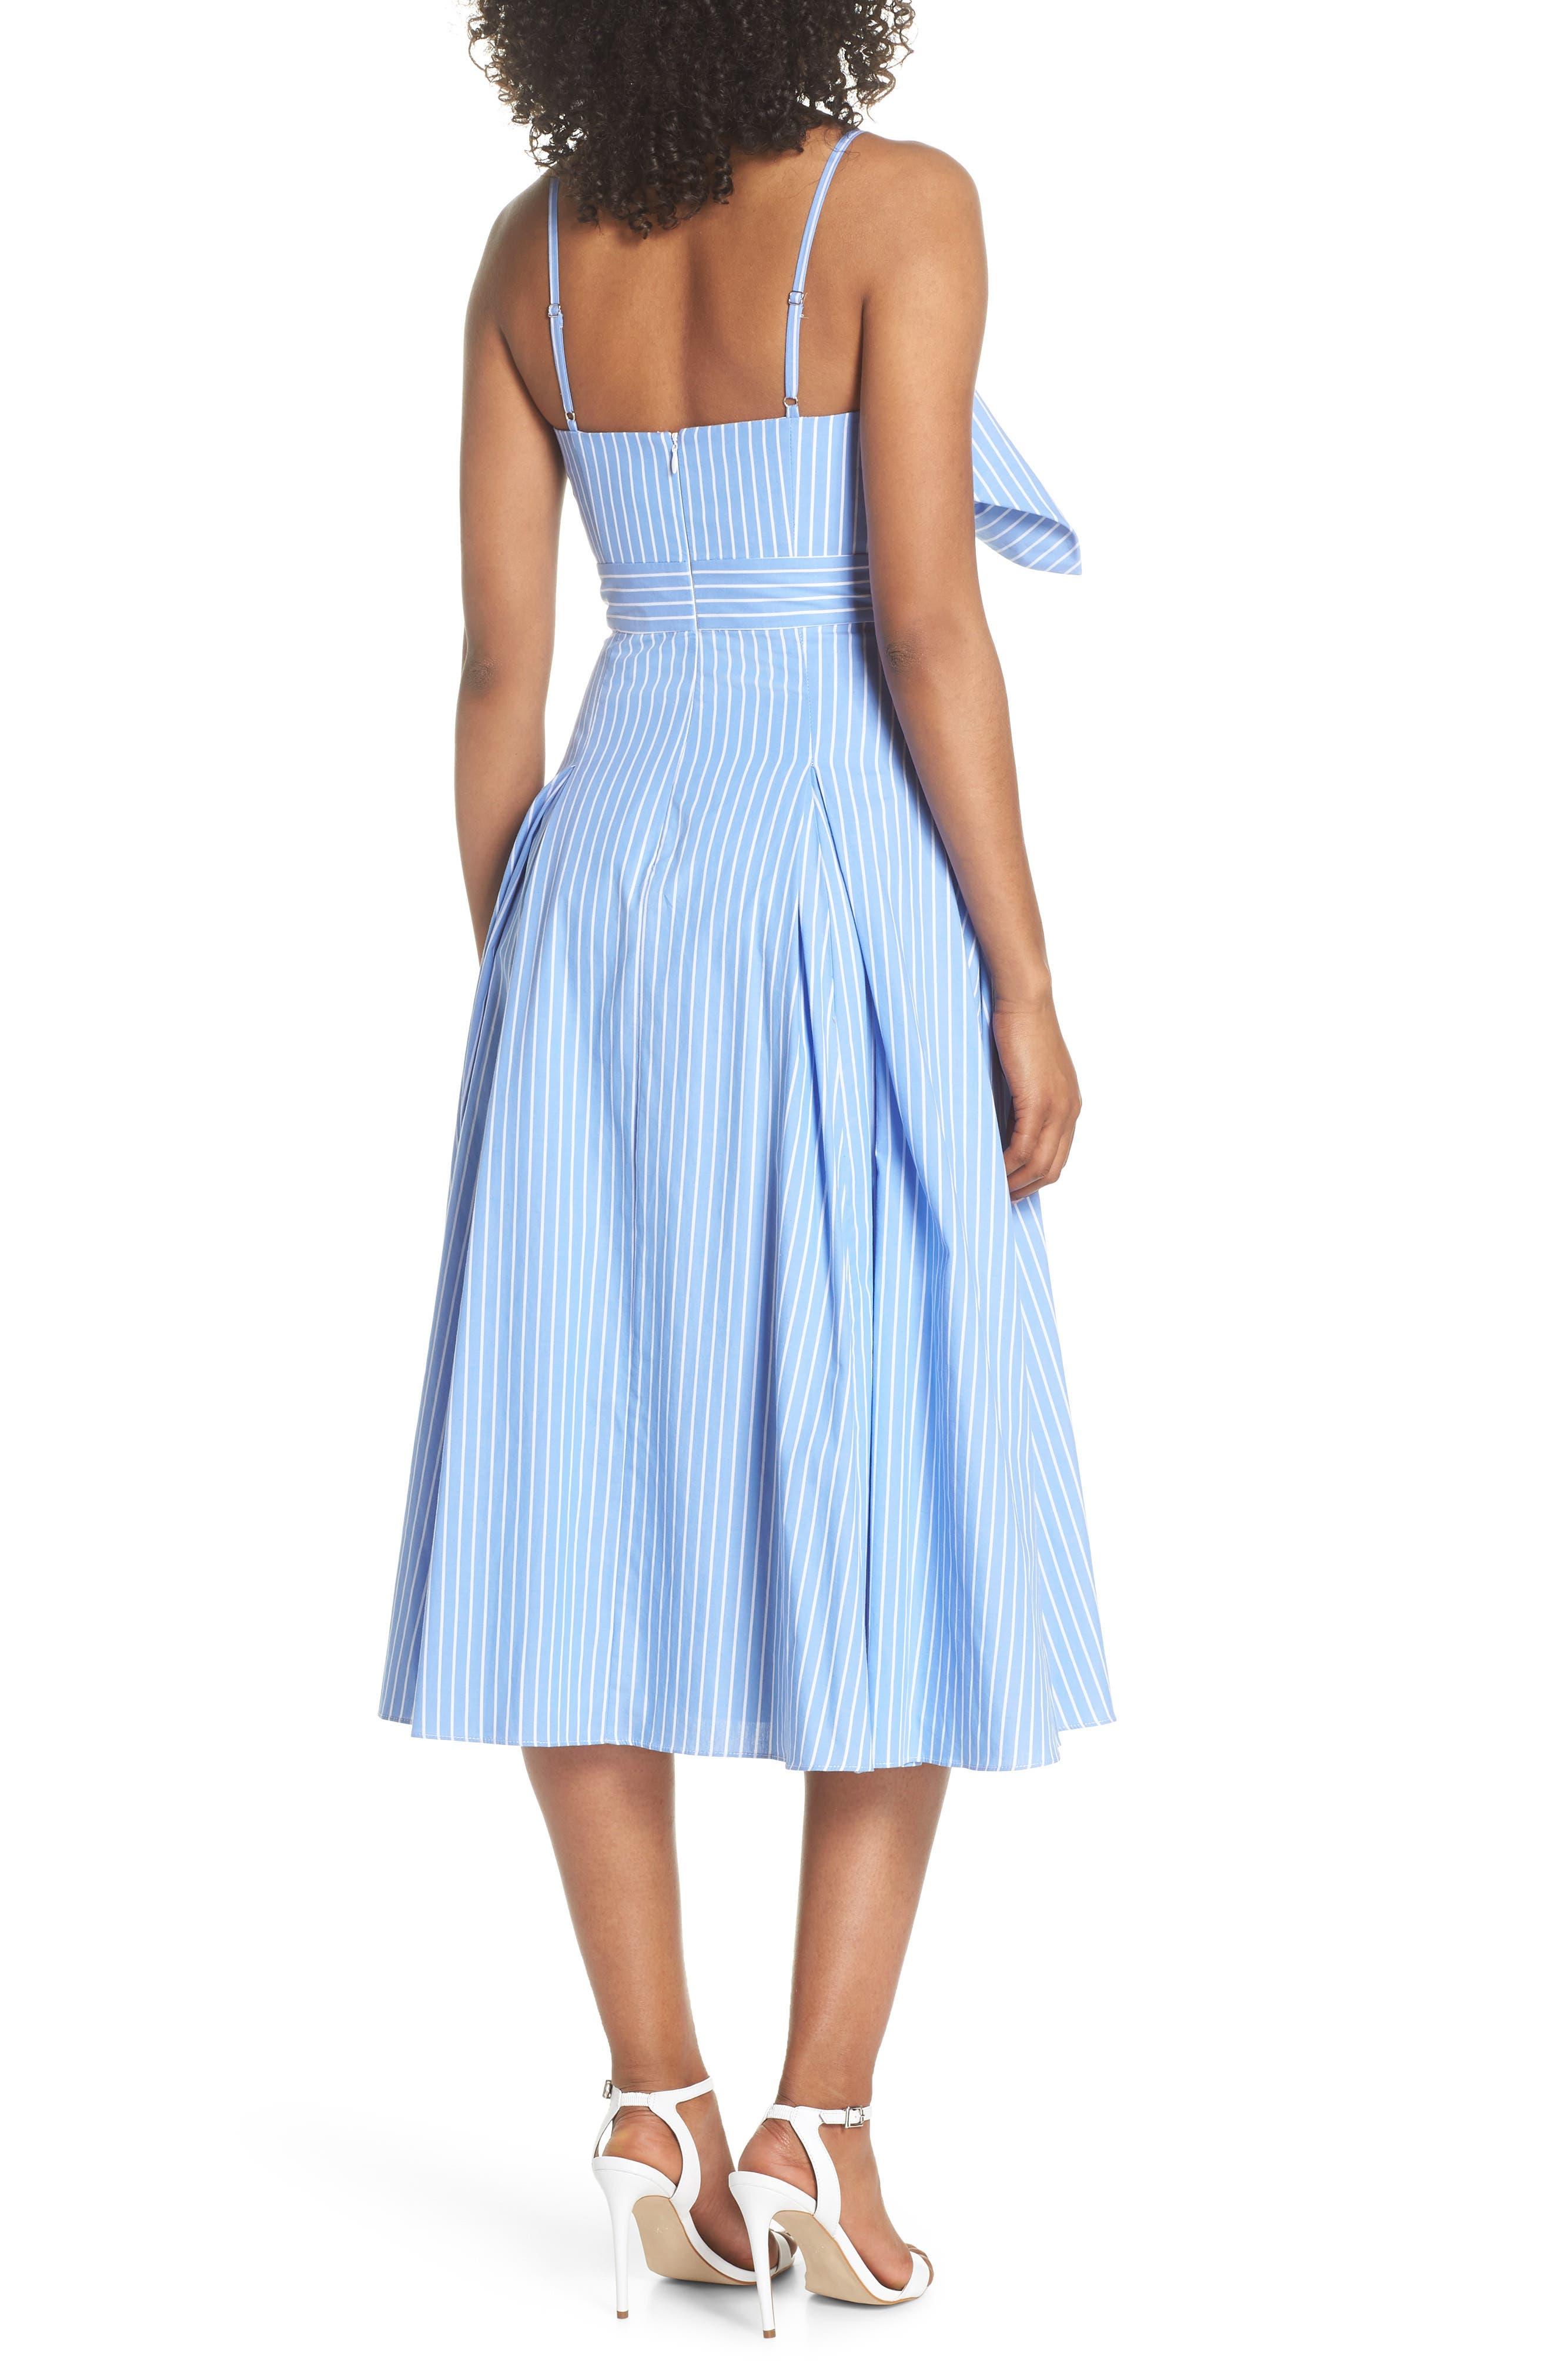 Becky Bow Front Tea Length Dress,                             Alternate thumbnail 2, color,                             Pale Blue/ White Stripe